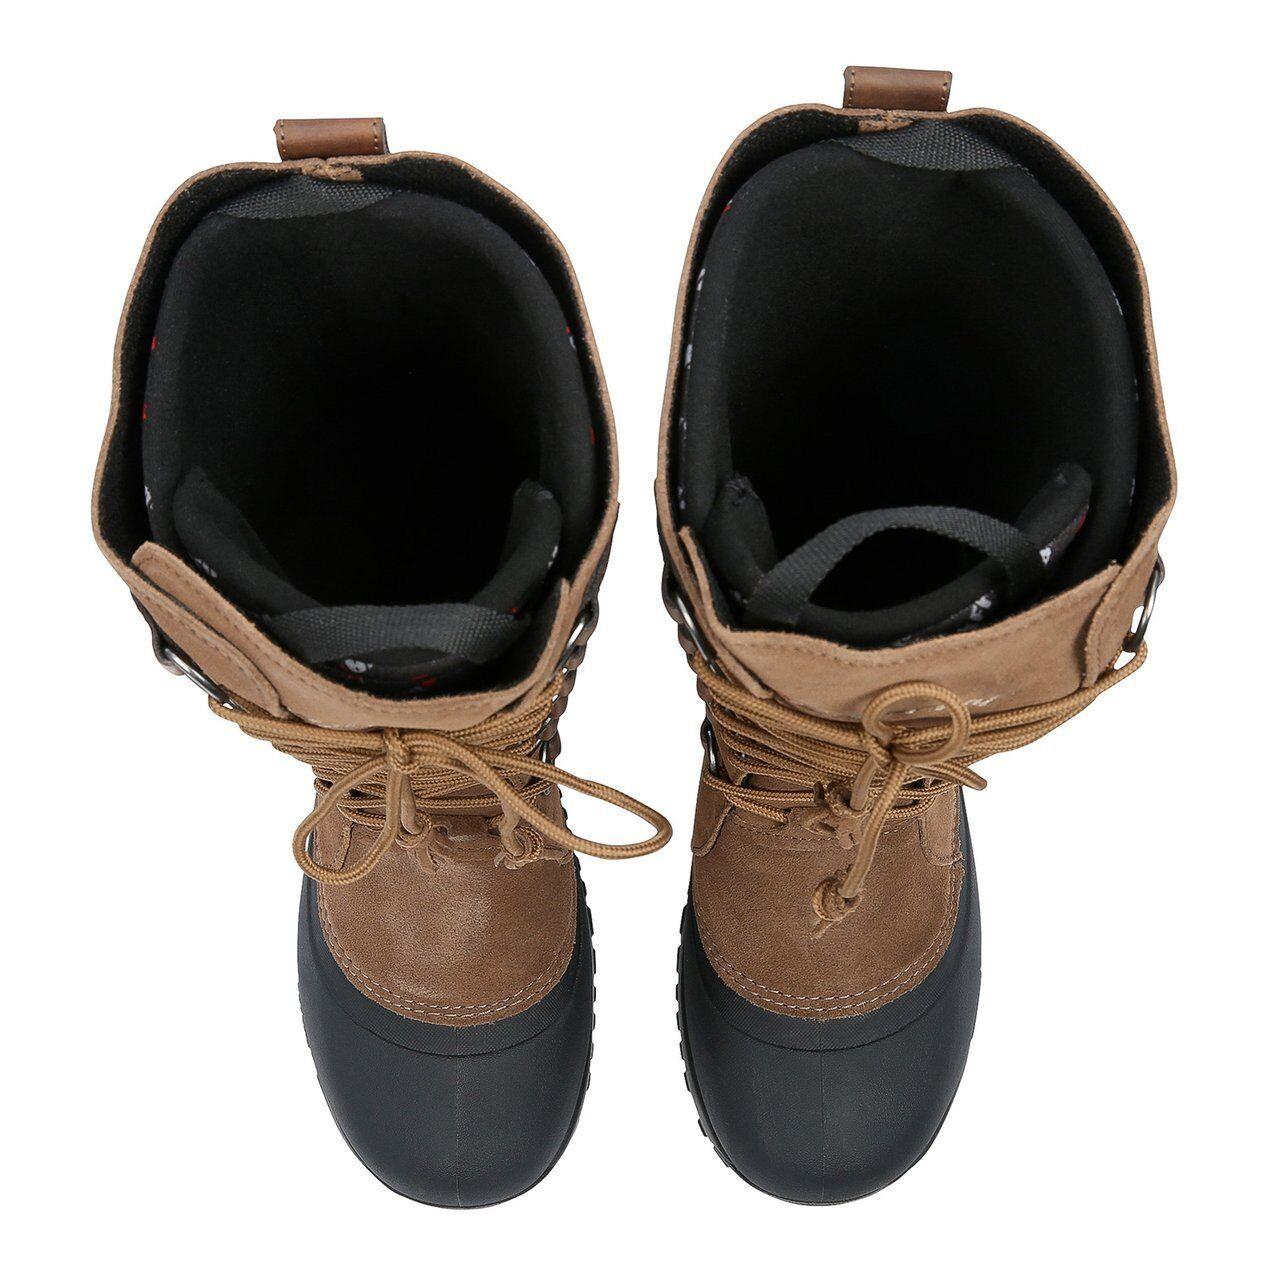 Baffin Coco Insulated Waterproof Winter Snow Stiefel Taupe Damenschuhe Damenschuhe Taupe Größe 8 e19e03